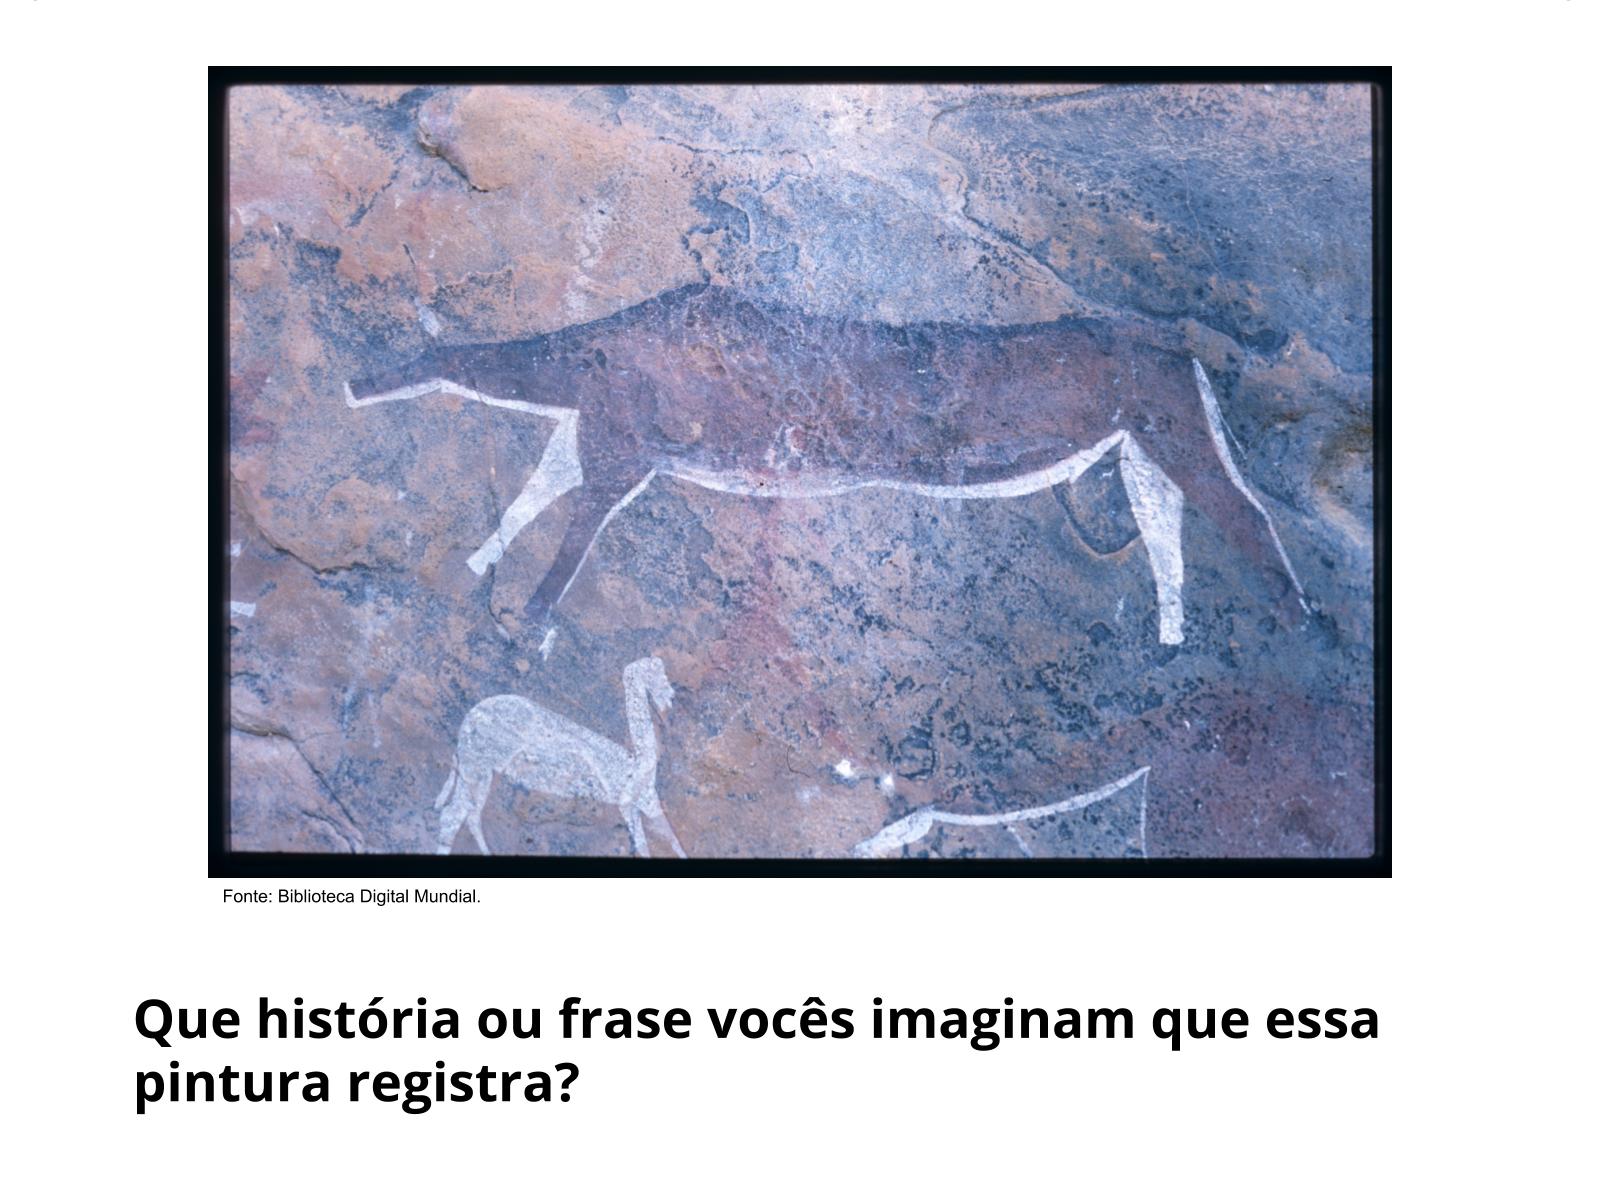 Pinturas rupestres e geoglifos: os registros mudando o jeito de viver dos seres humanos